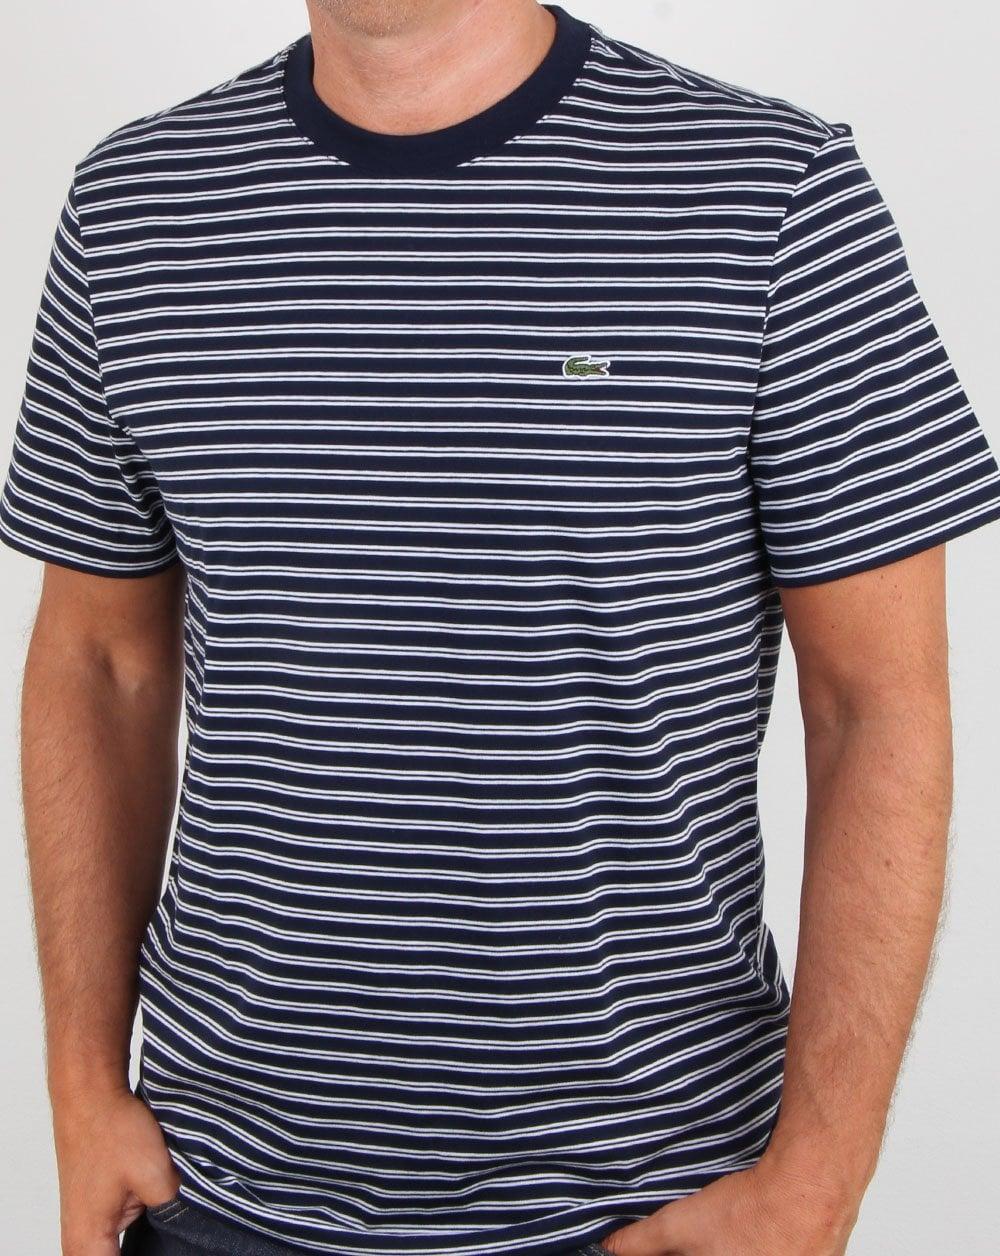 2018 buty najlepsze podejście dobra obsługa Lacoste Stripe T-shirt Navy/White